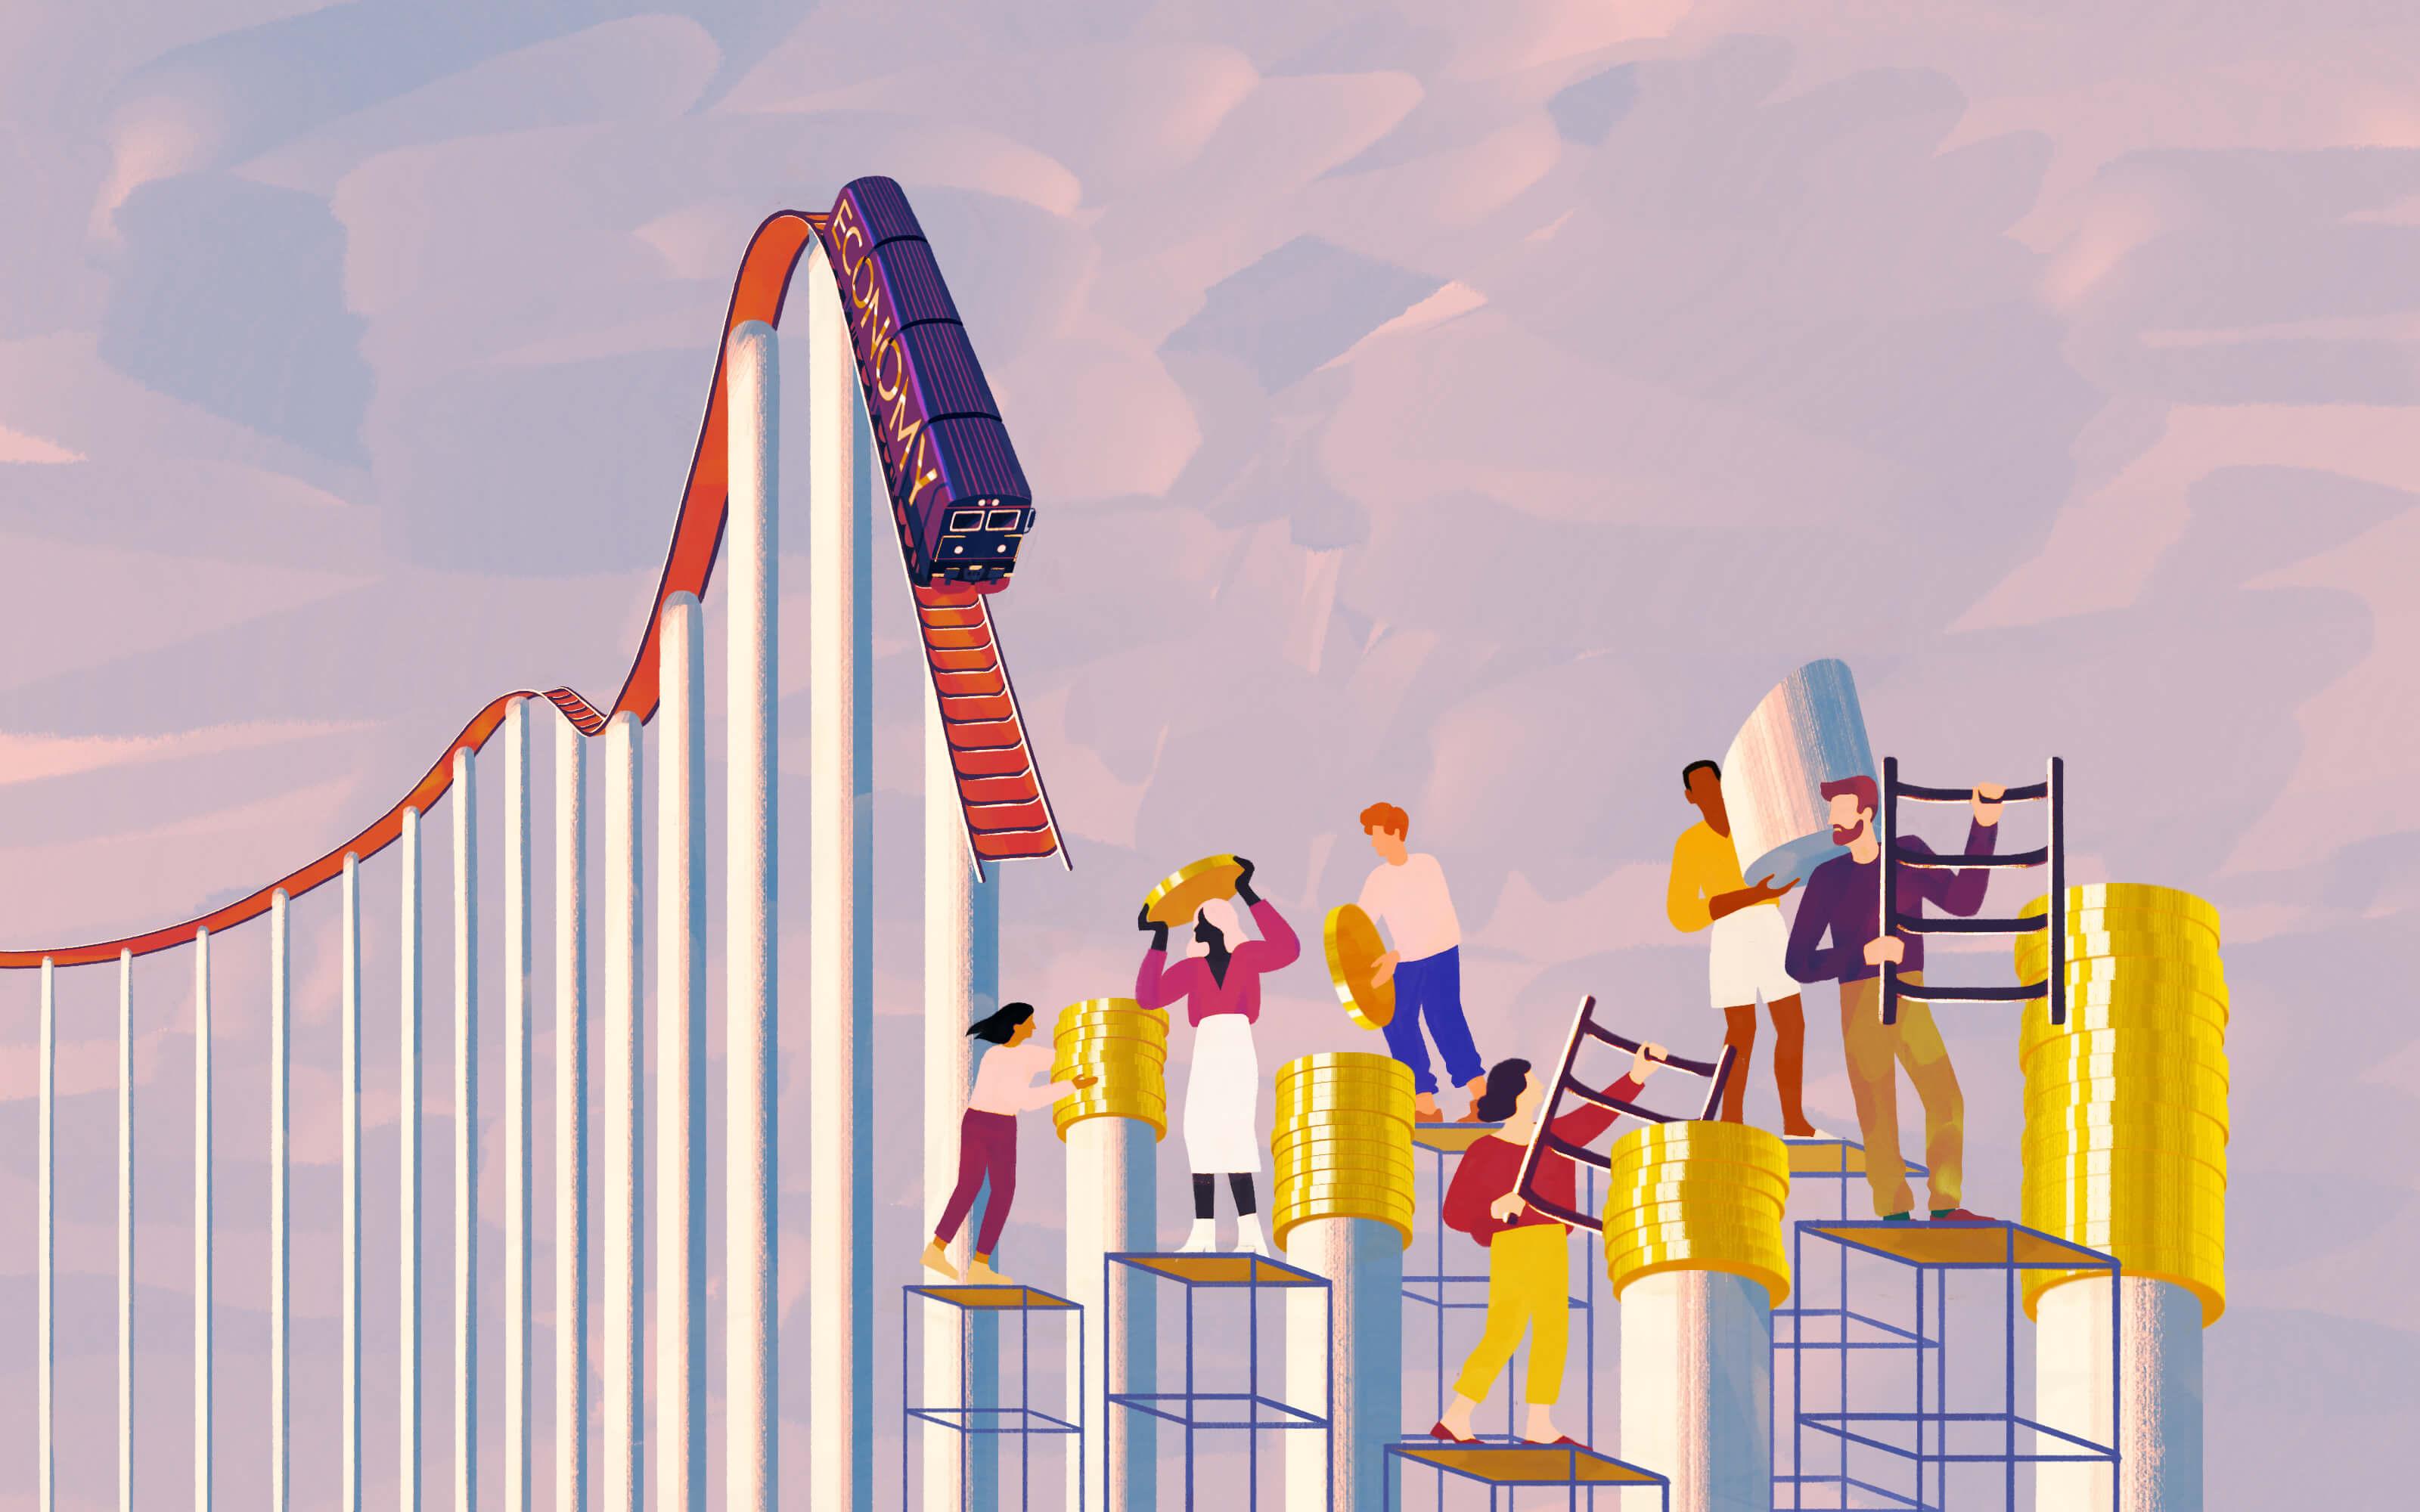 Illustration of rollercoaster